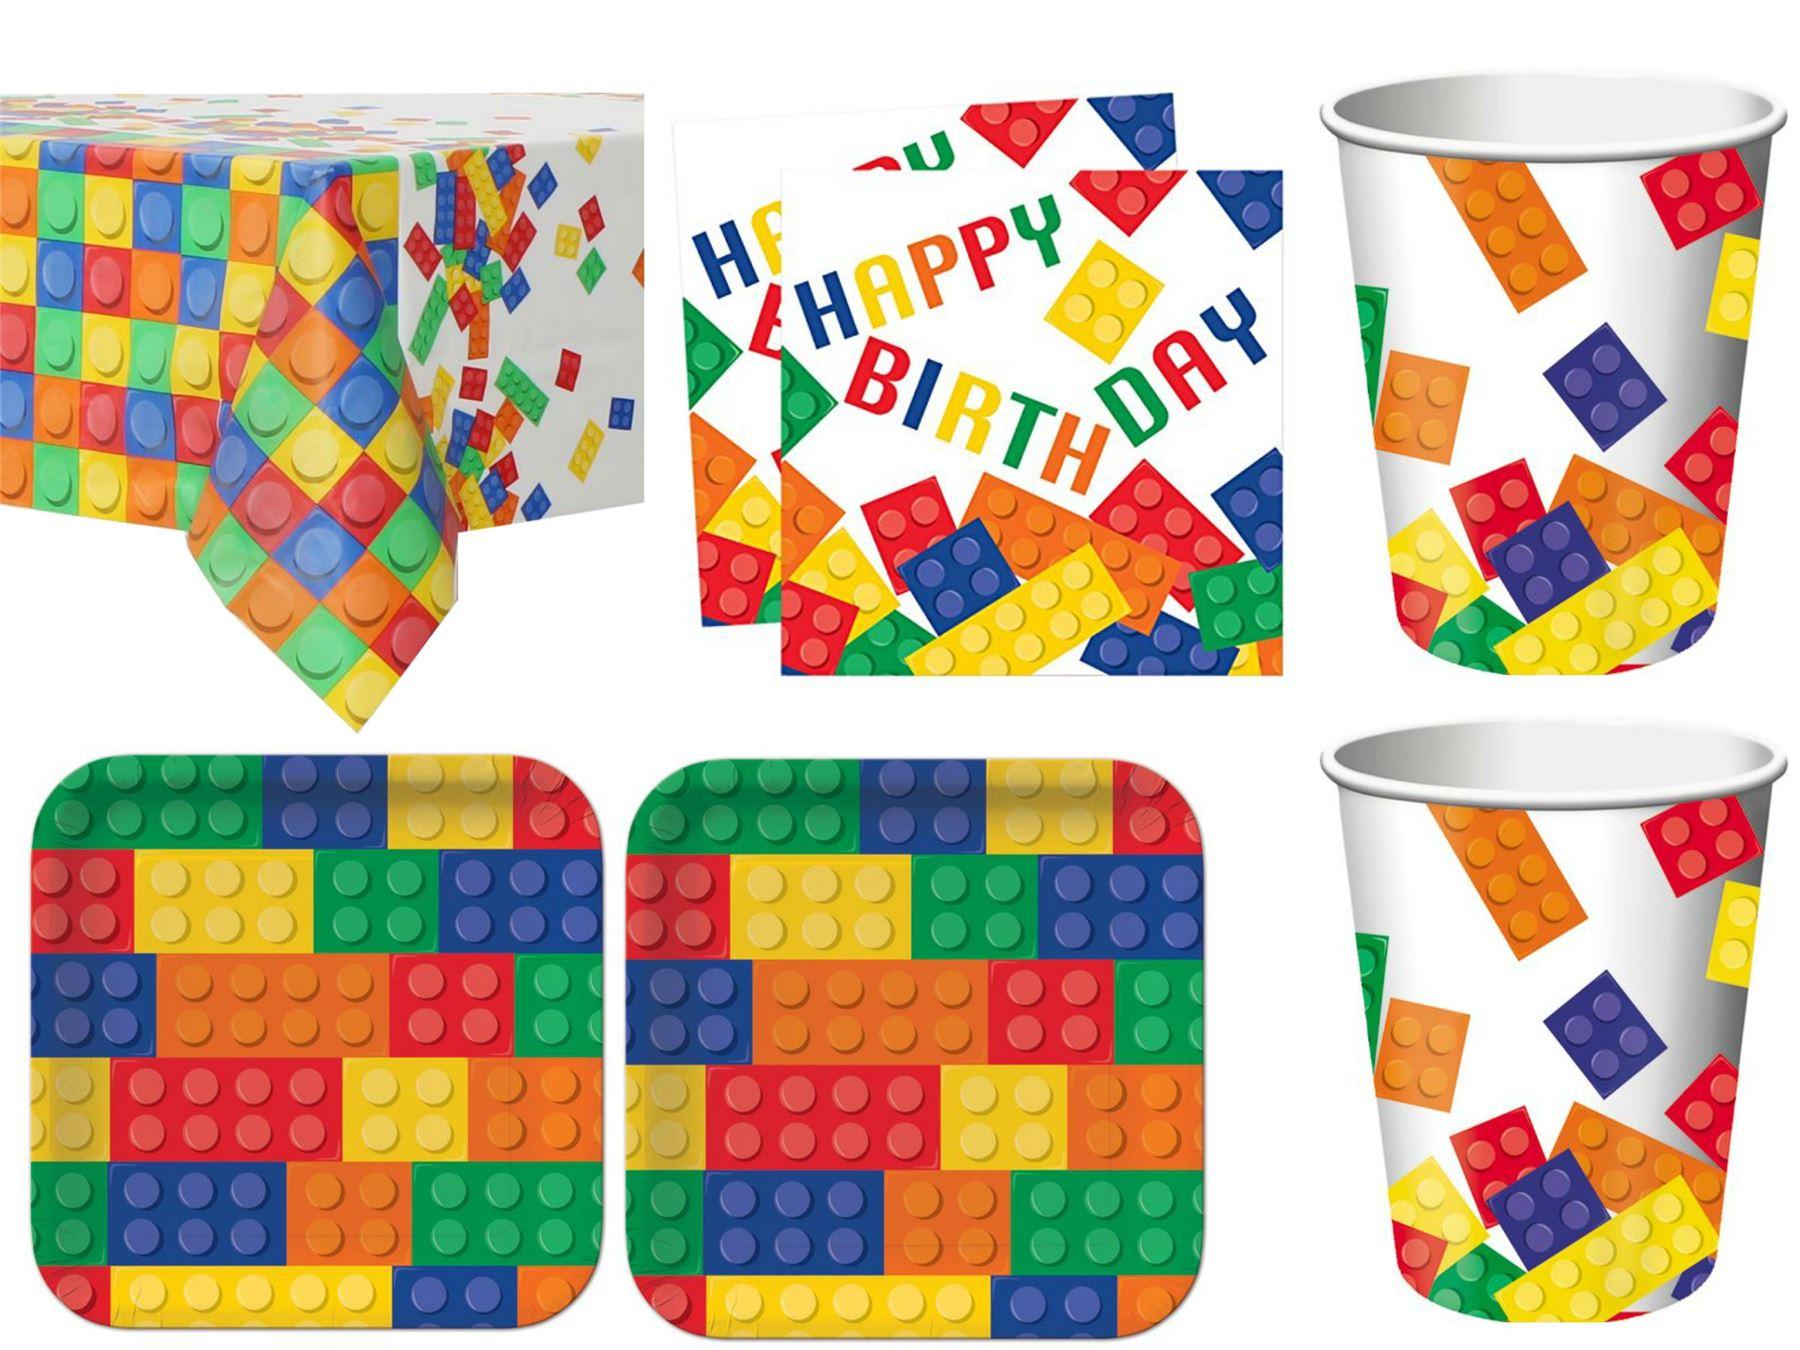 Block-Party-Lego-Tableware-Birthday-Party-Kit-Supplies-  sc 1 st  eBay & Block Party Lego Tableware Birthday Party Kit Supplies 8 or 16 ...